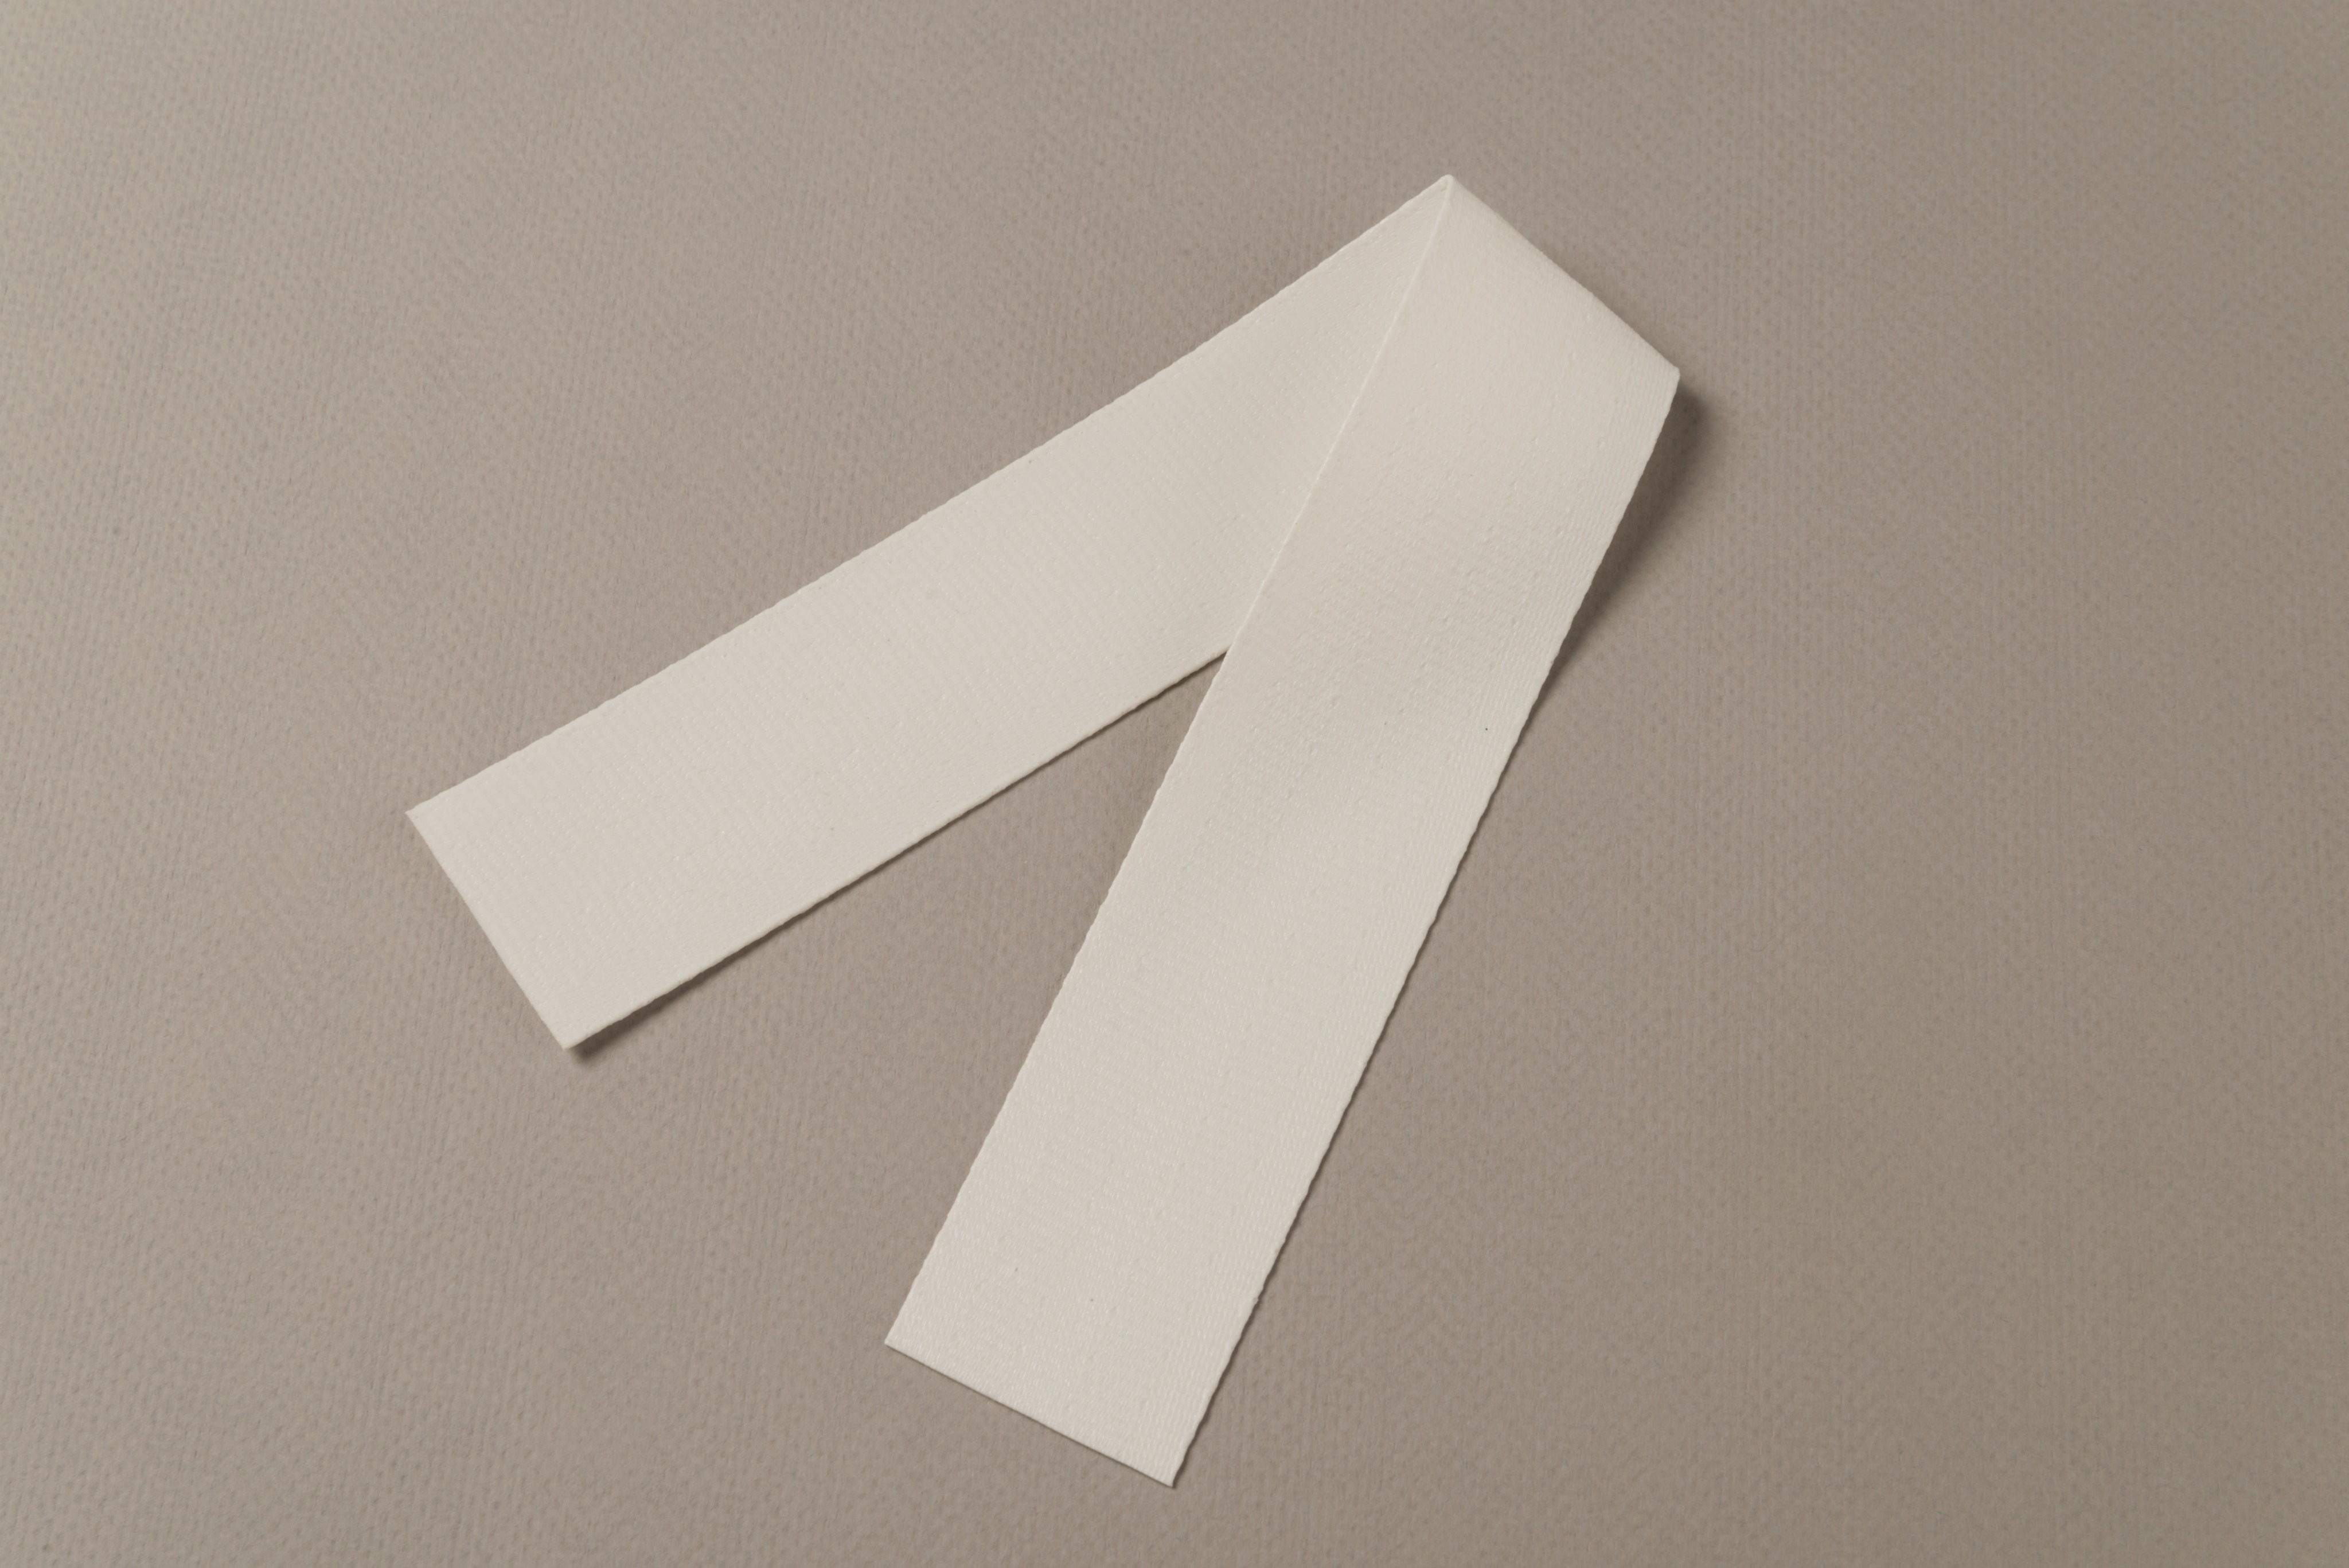 weldable-webbing-2-inch-white